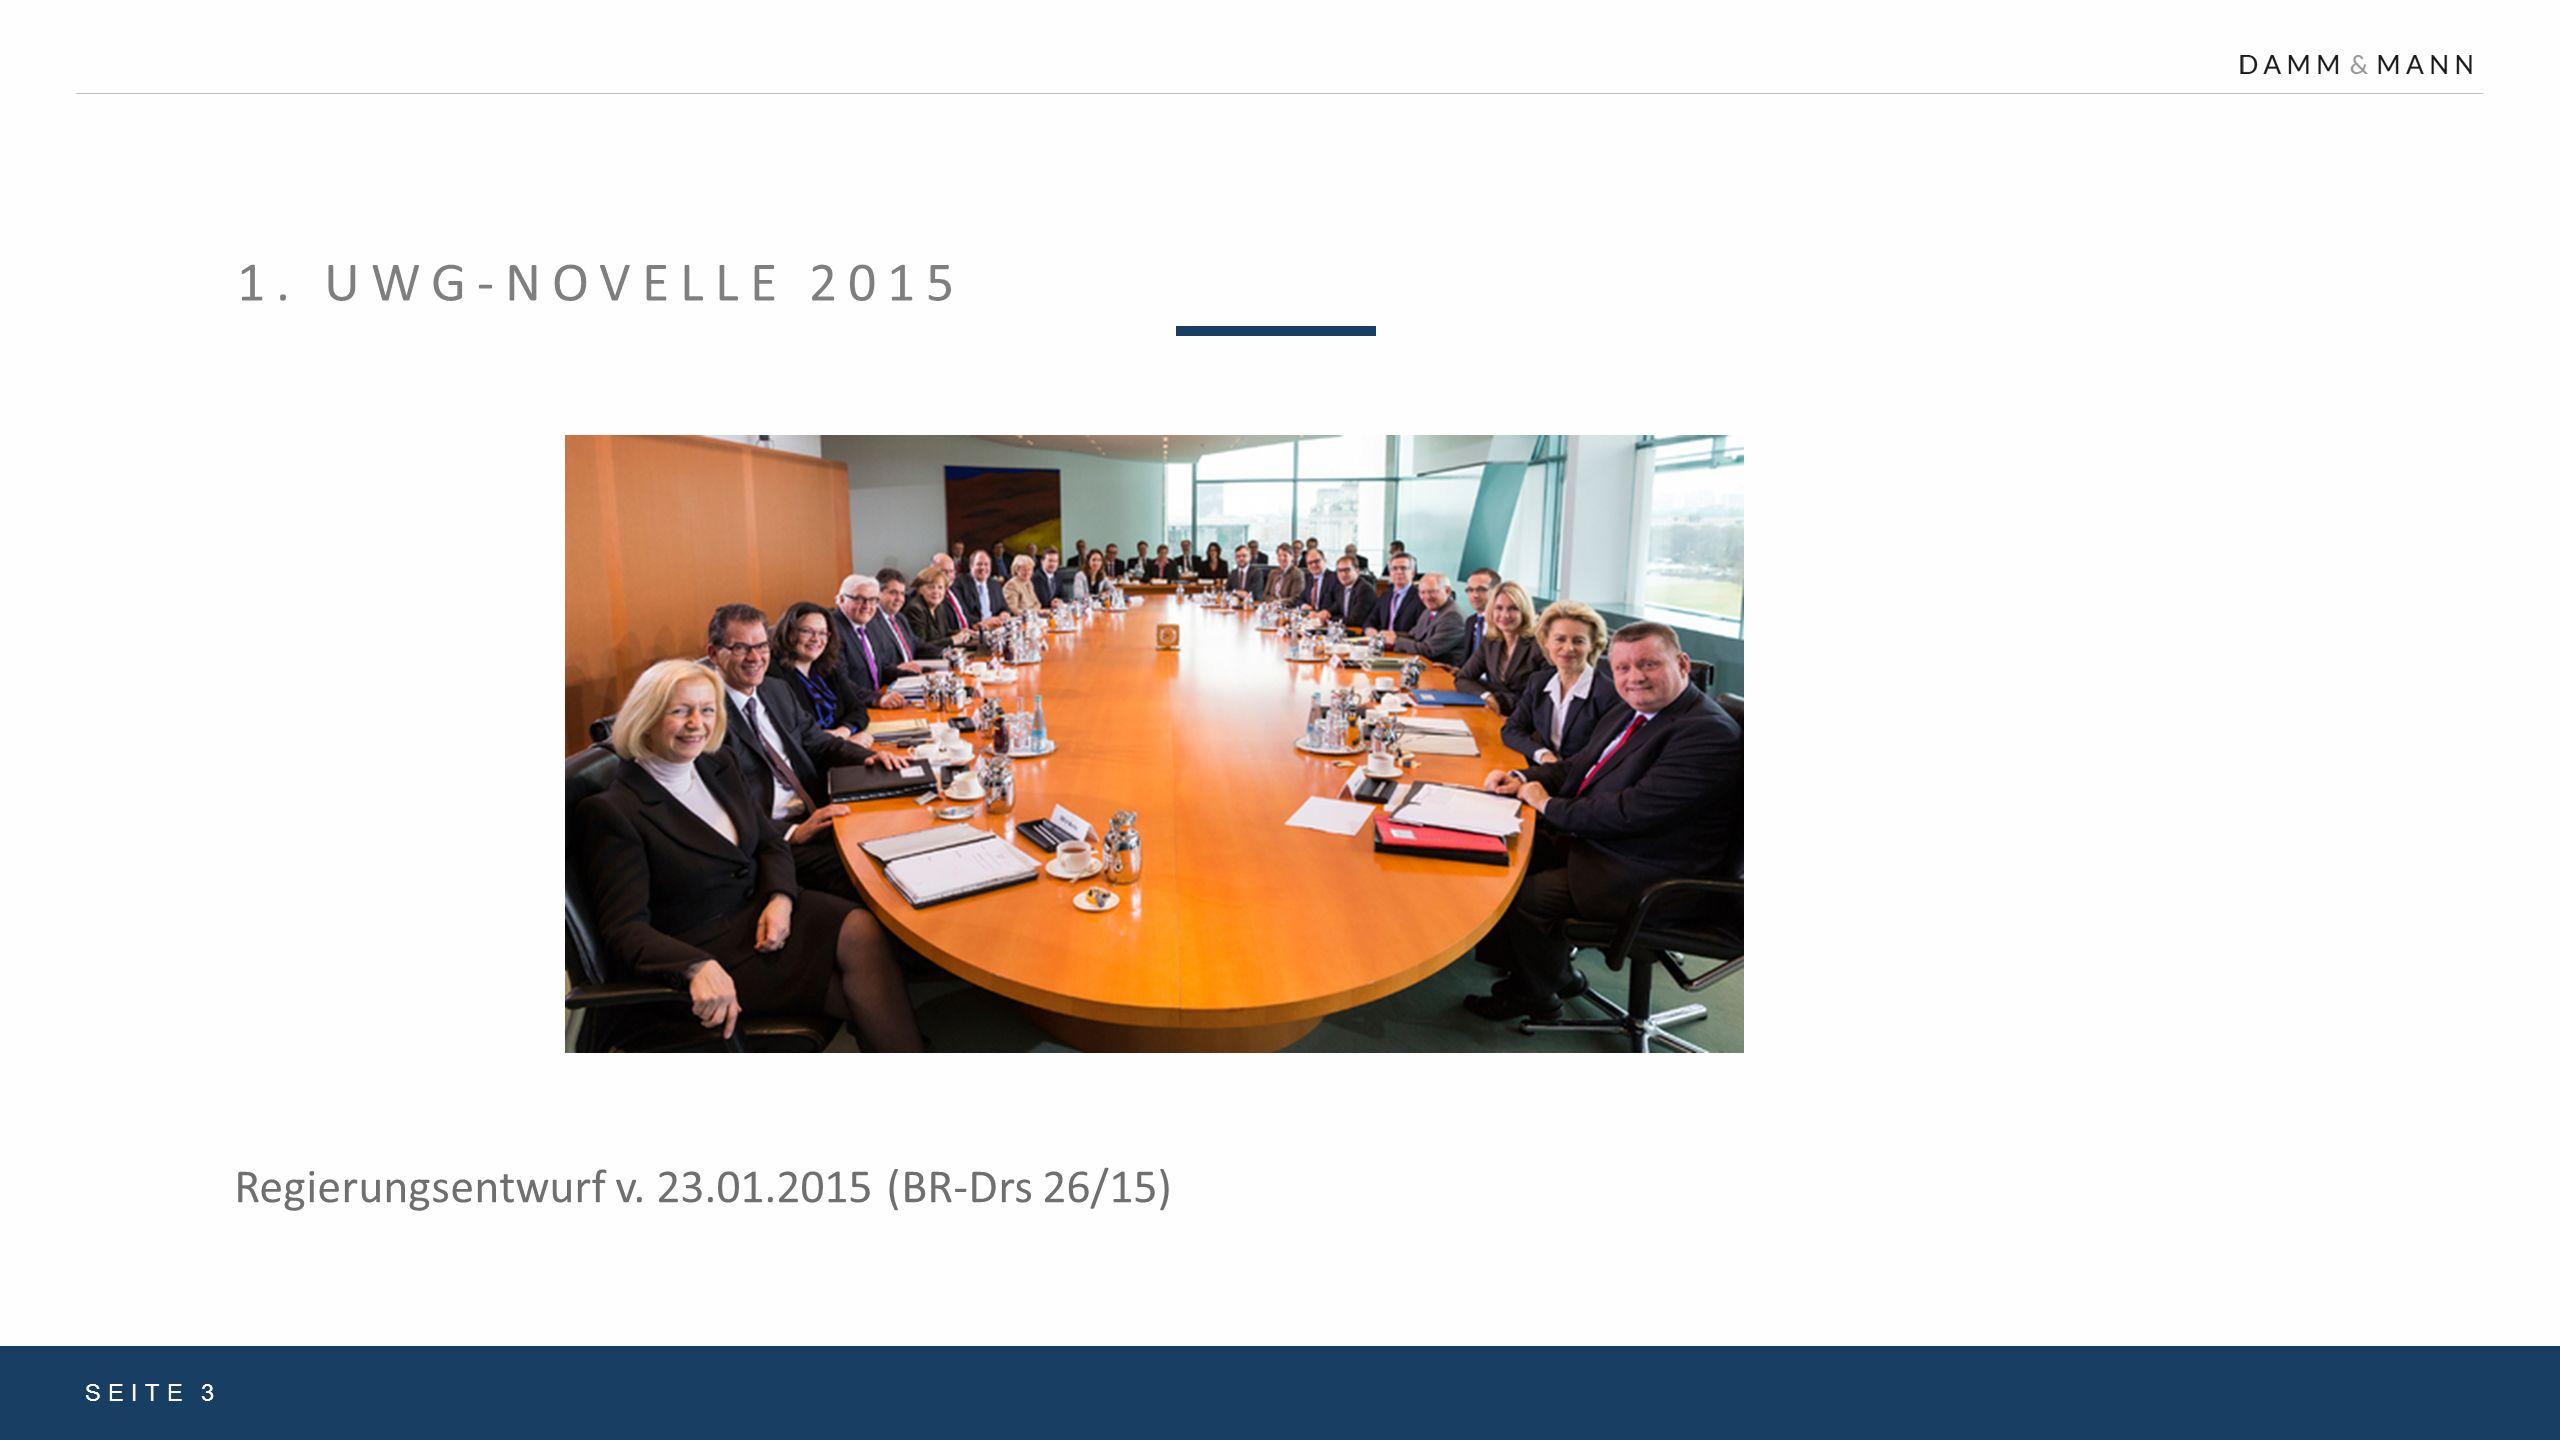 1. UWG-Novelle 2015 Regierungsentwurf v. 23.01.2015 (BR-Drs 26/15)